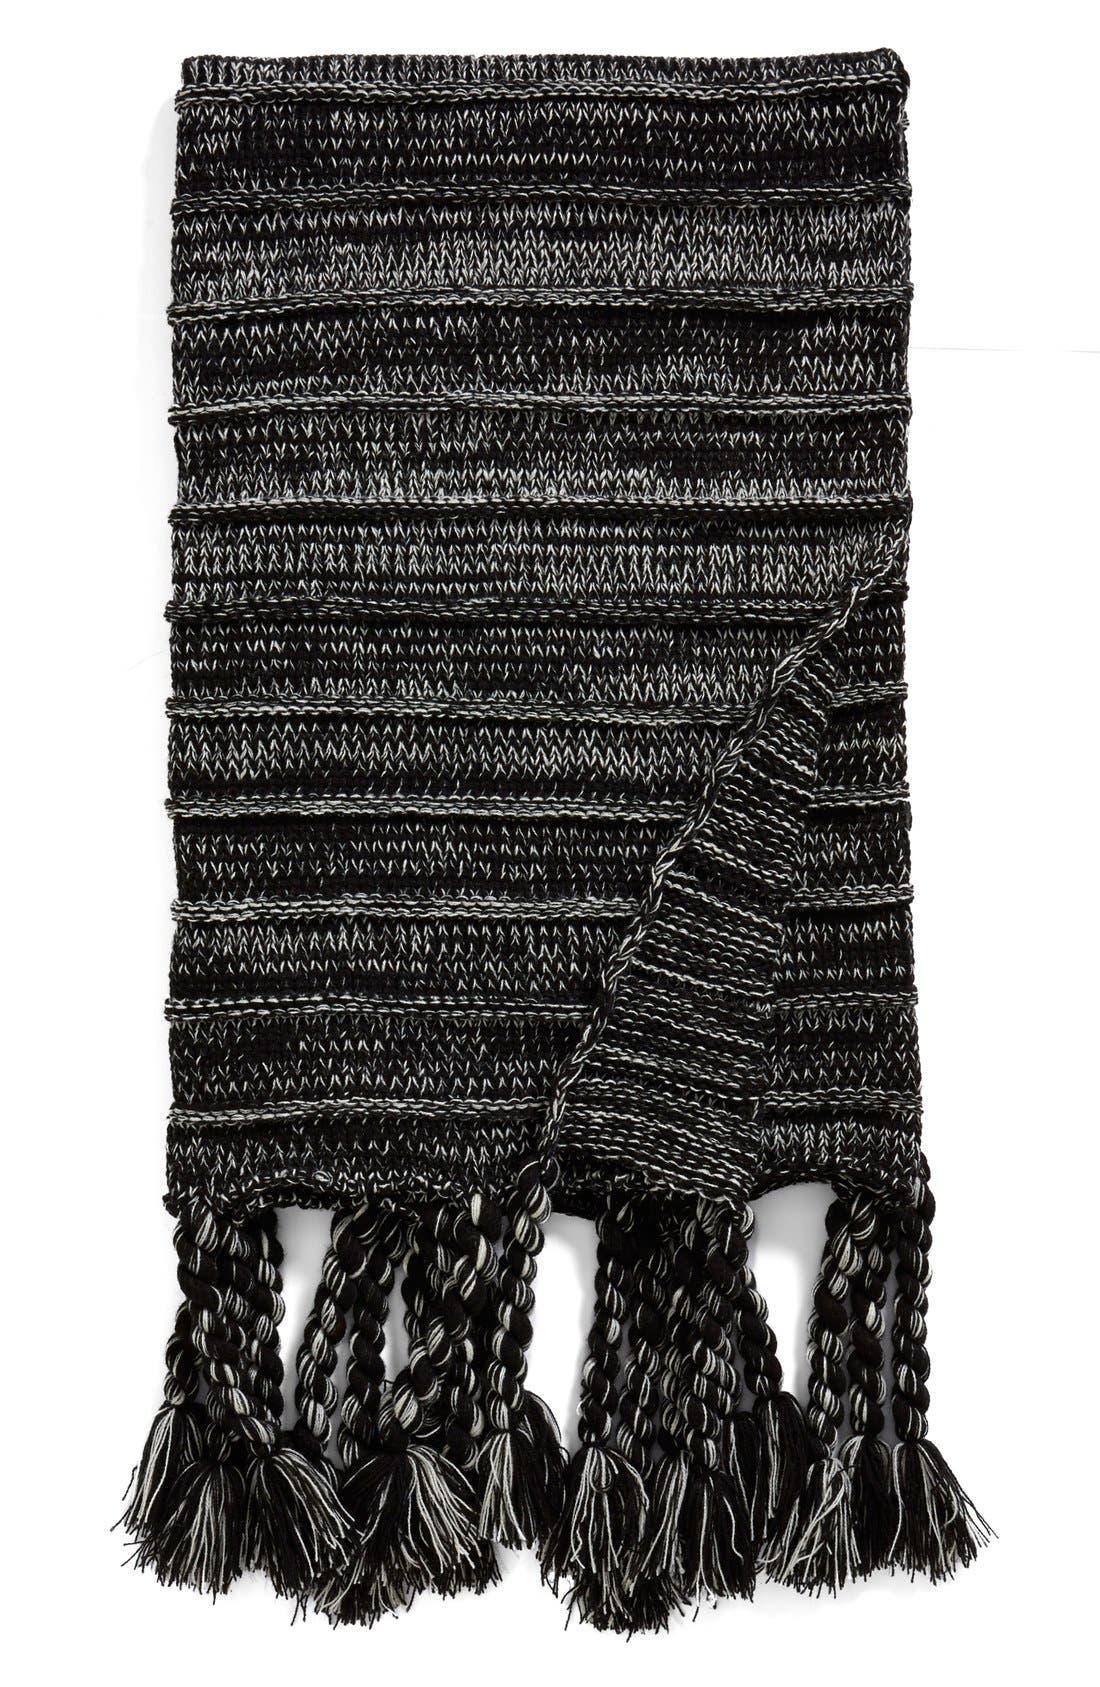 Alternate Image 1 Selected - Kennebunk Home Chunky Braid Throw